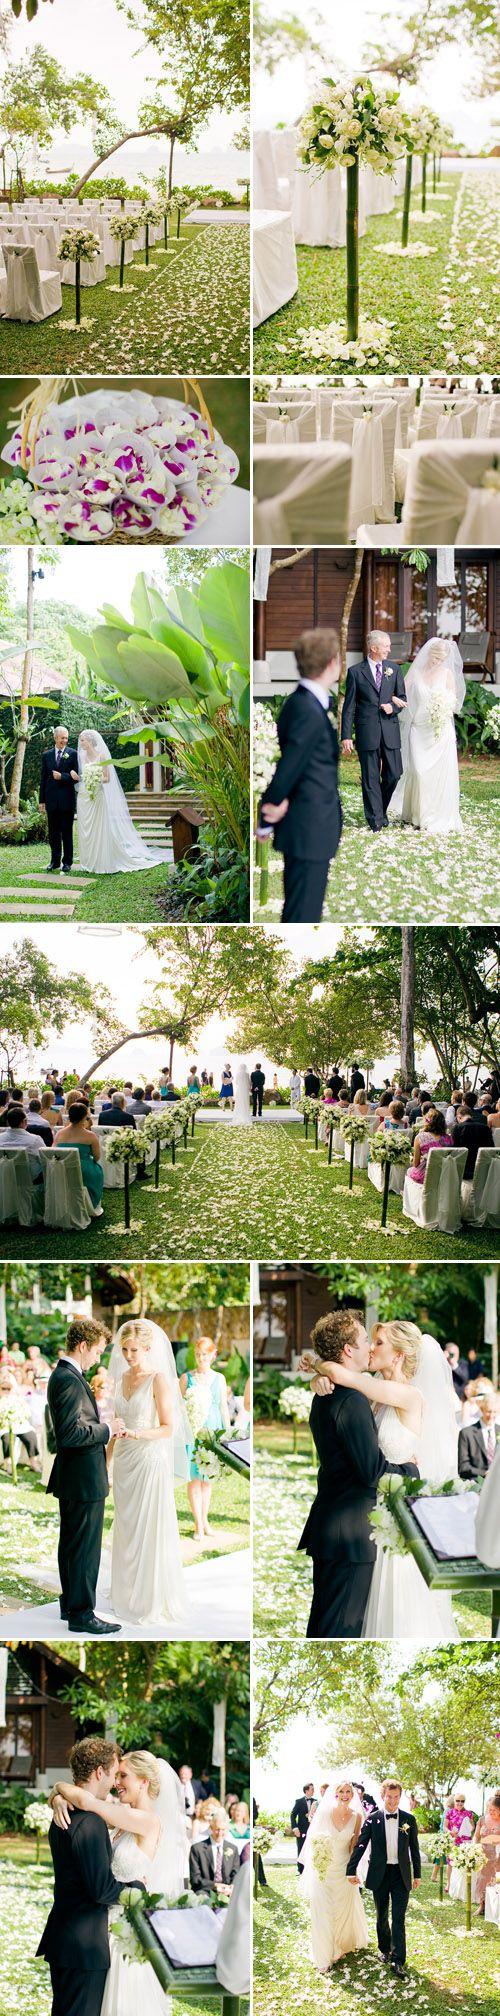 best 25 outdoor wedding destinations ideas on pinterest wedding